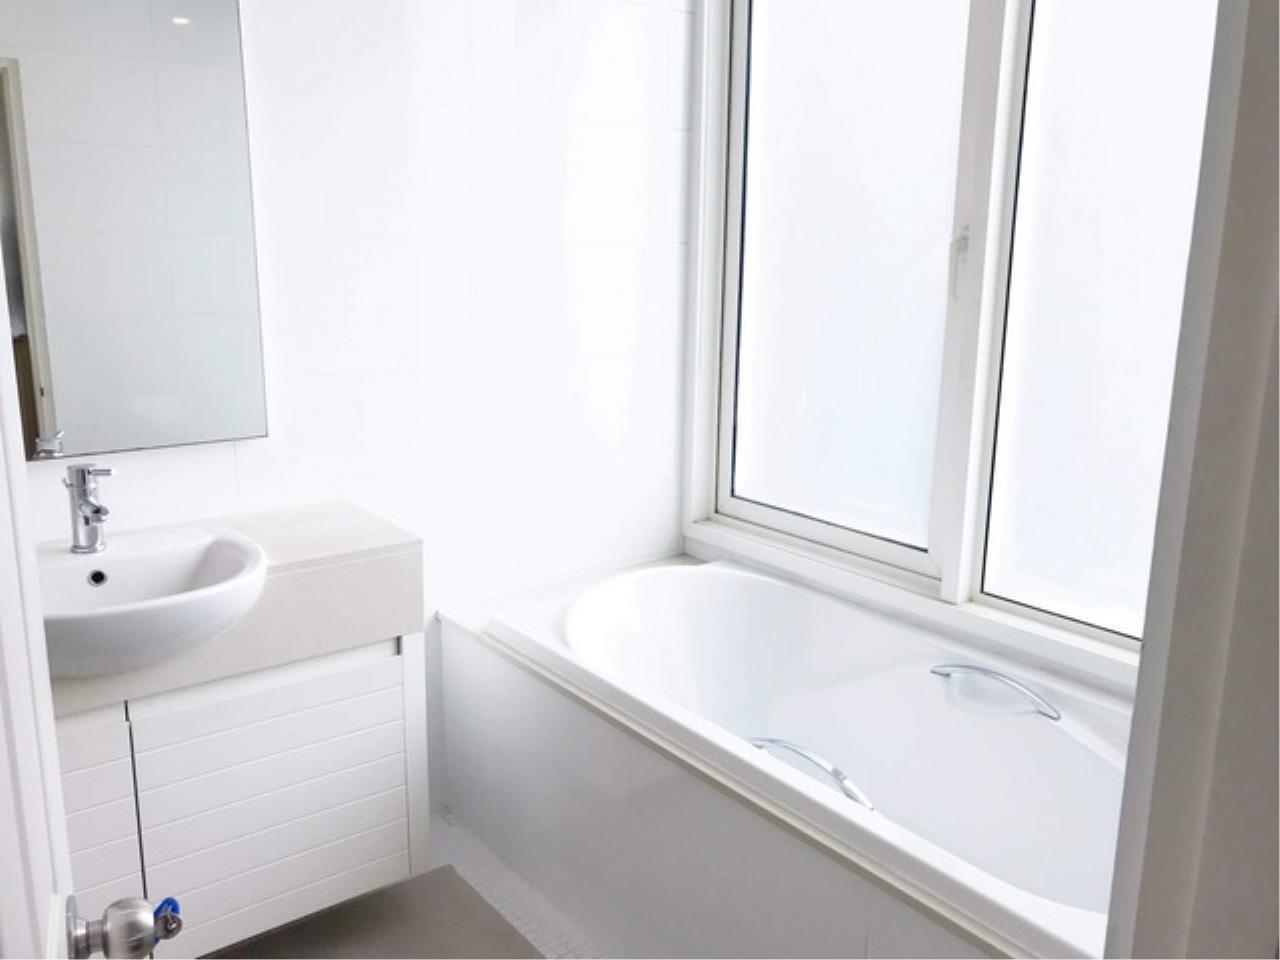 Ta (+66 9 5935 1592) Agency's SALE Condo Siri Residence by Sansiri 2 Bed near BTS Prompong Thonglor Emporium Best Price (163,000B/sqm) 10